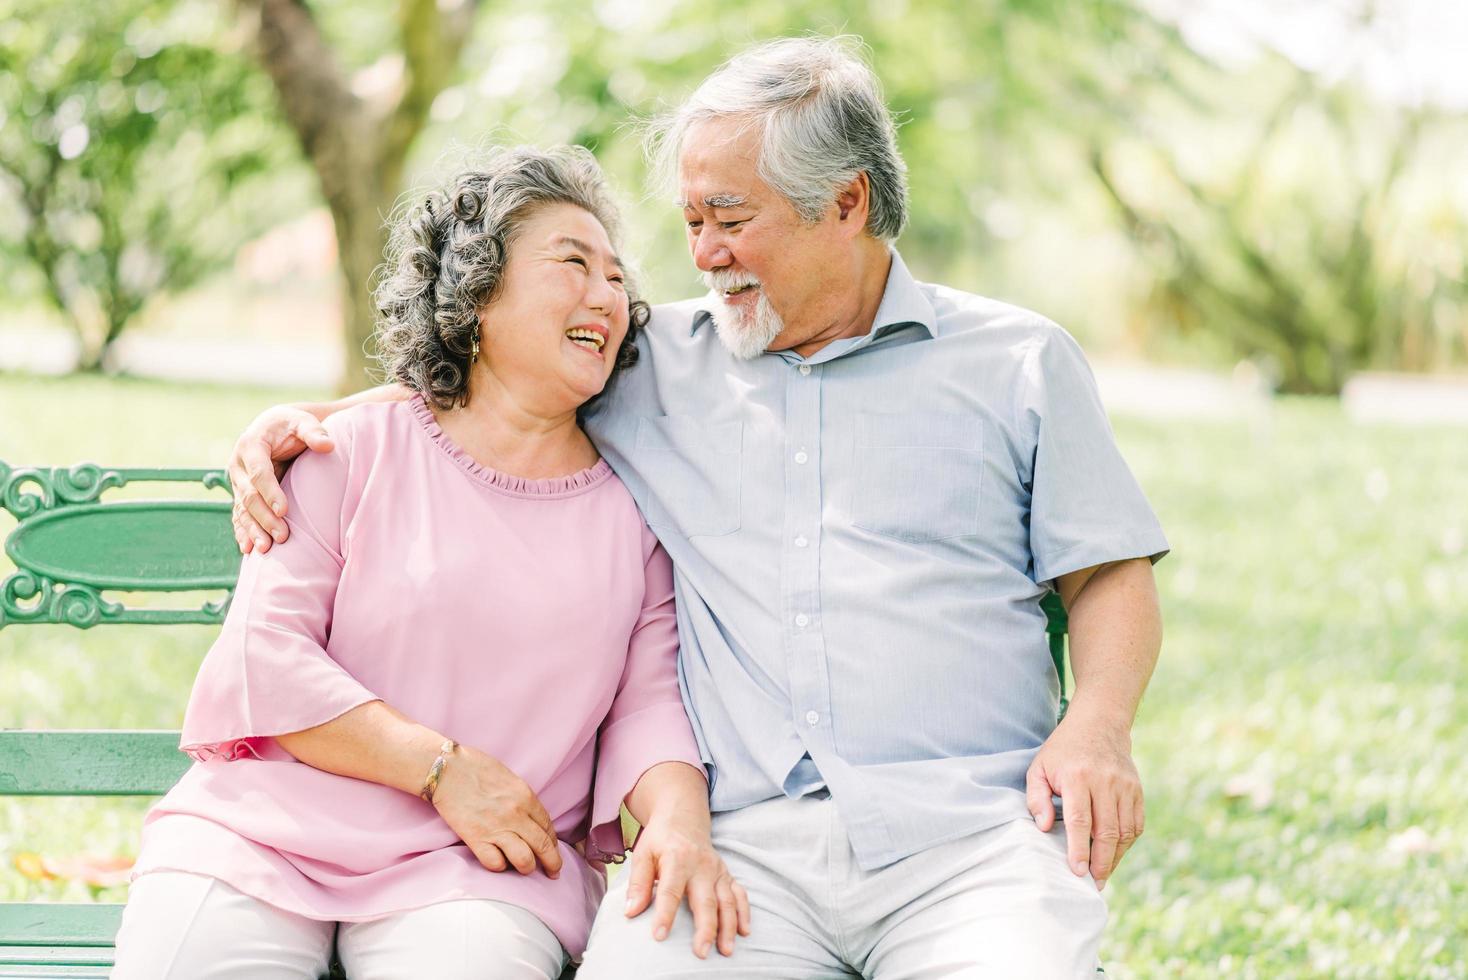 Happy senior couple in the park photo